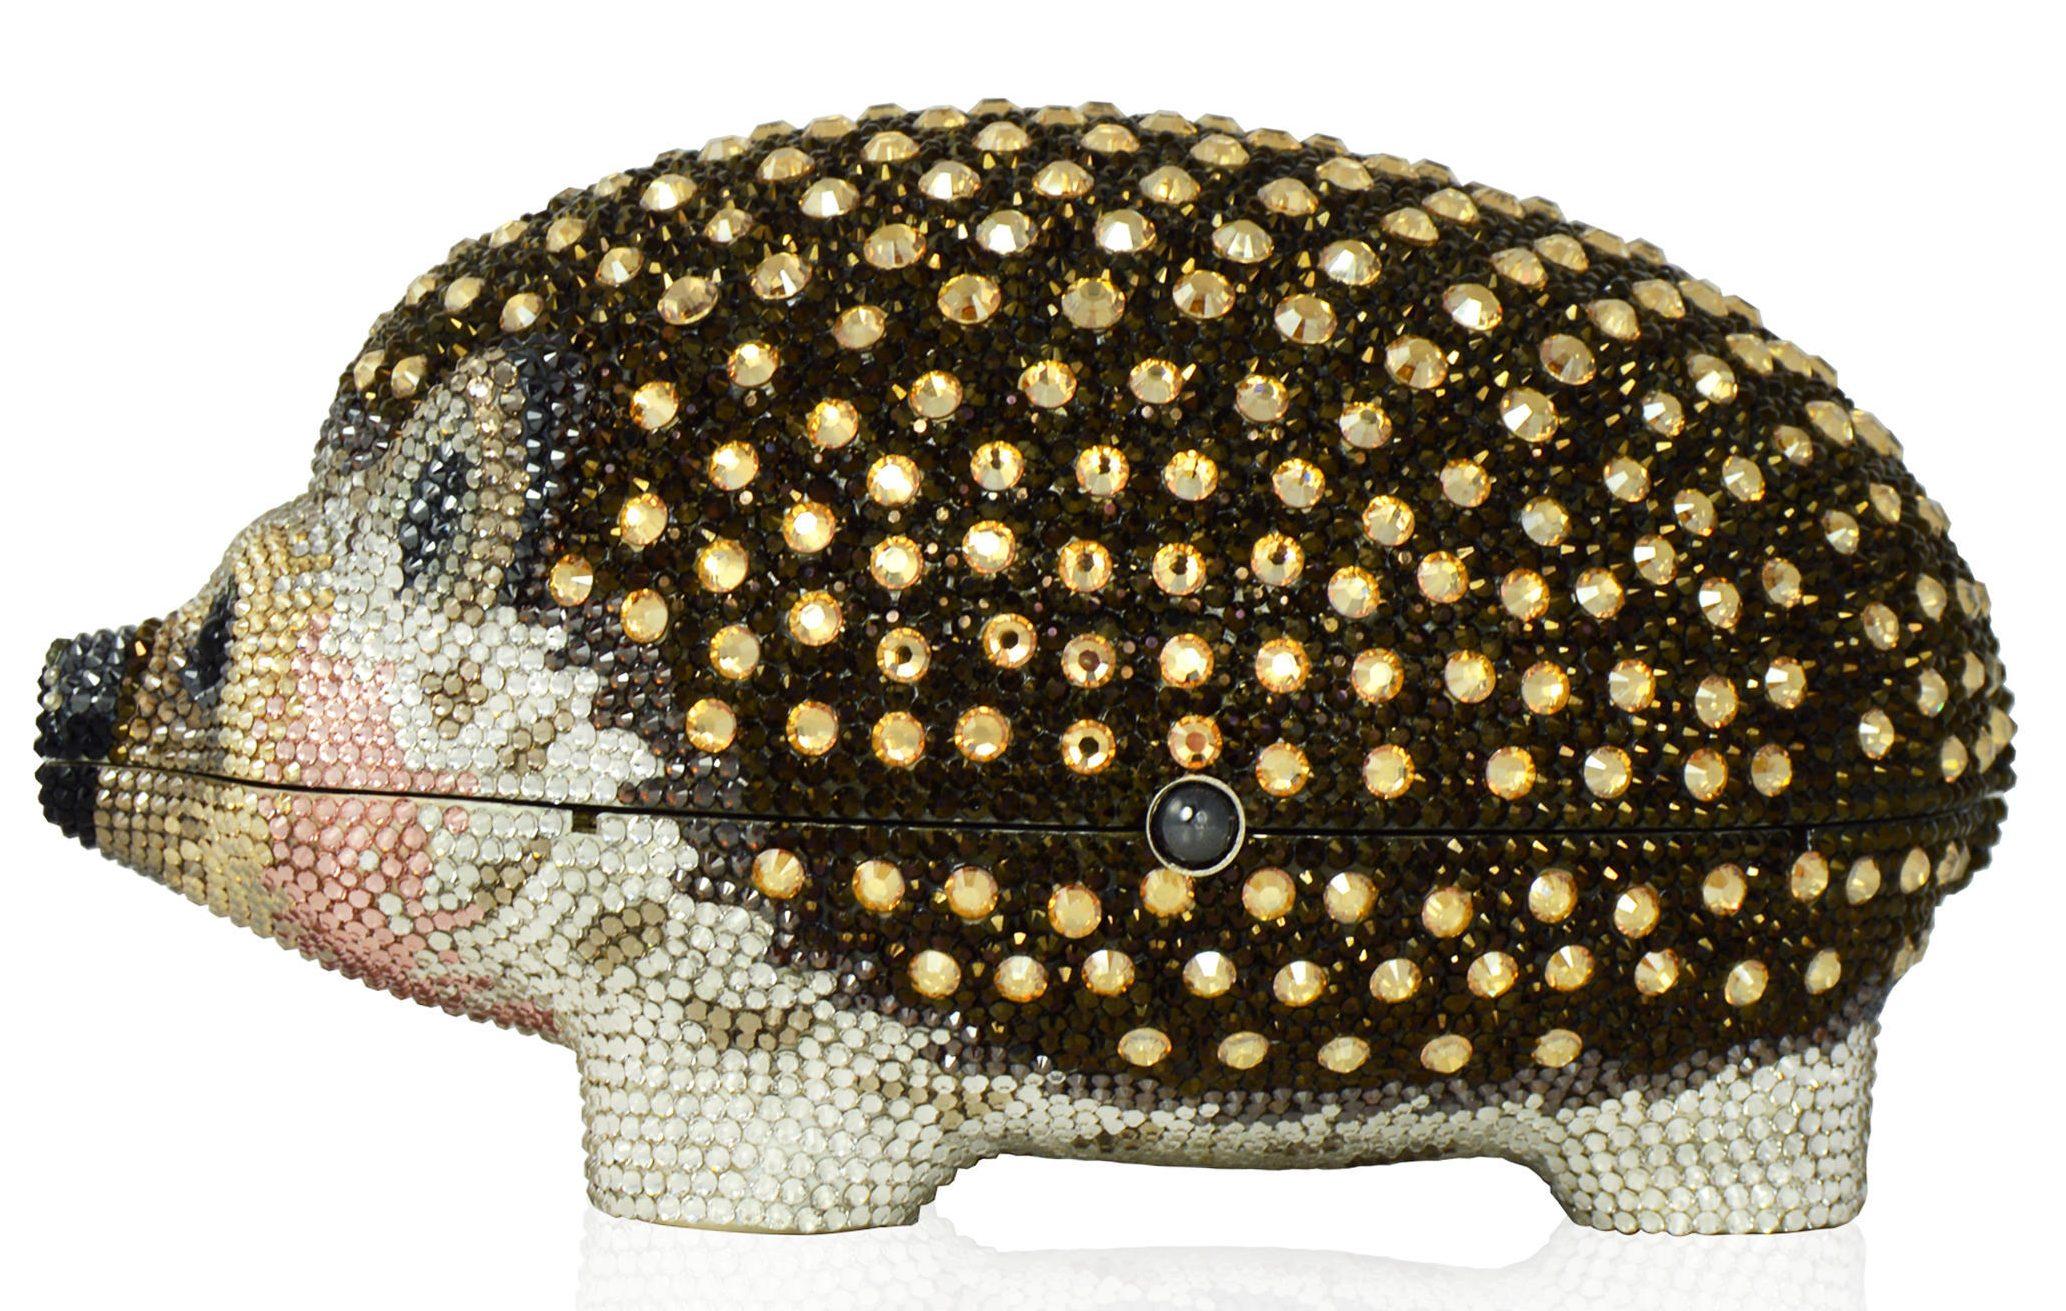 Judith Leiber Coutur Crystal Clutch Wilbur the Hedgehog